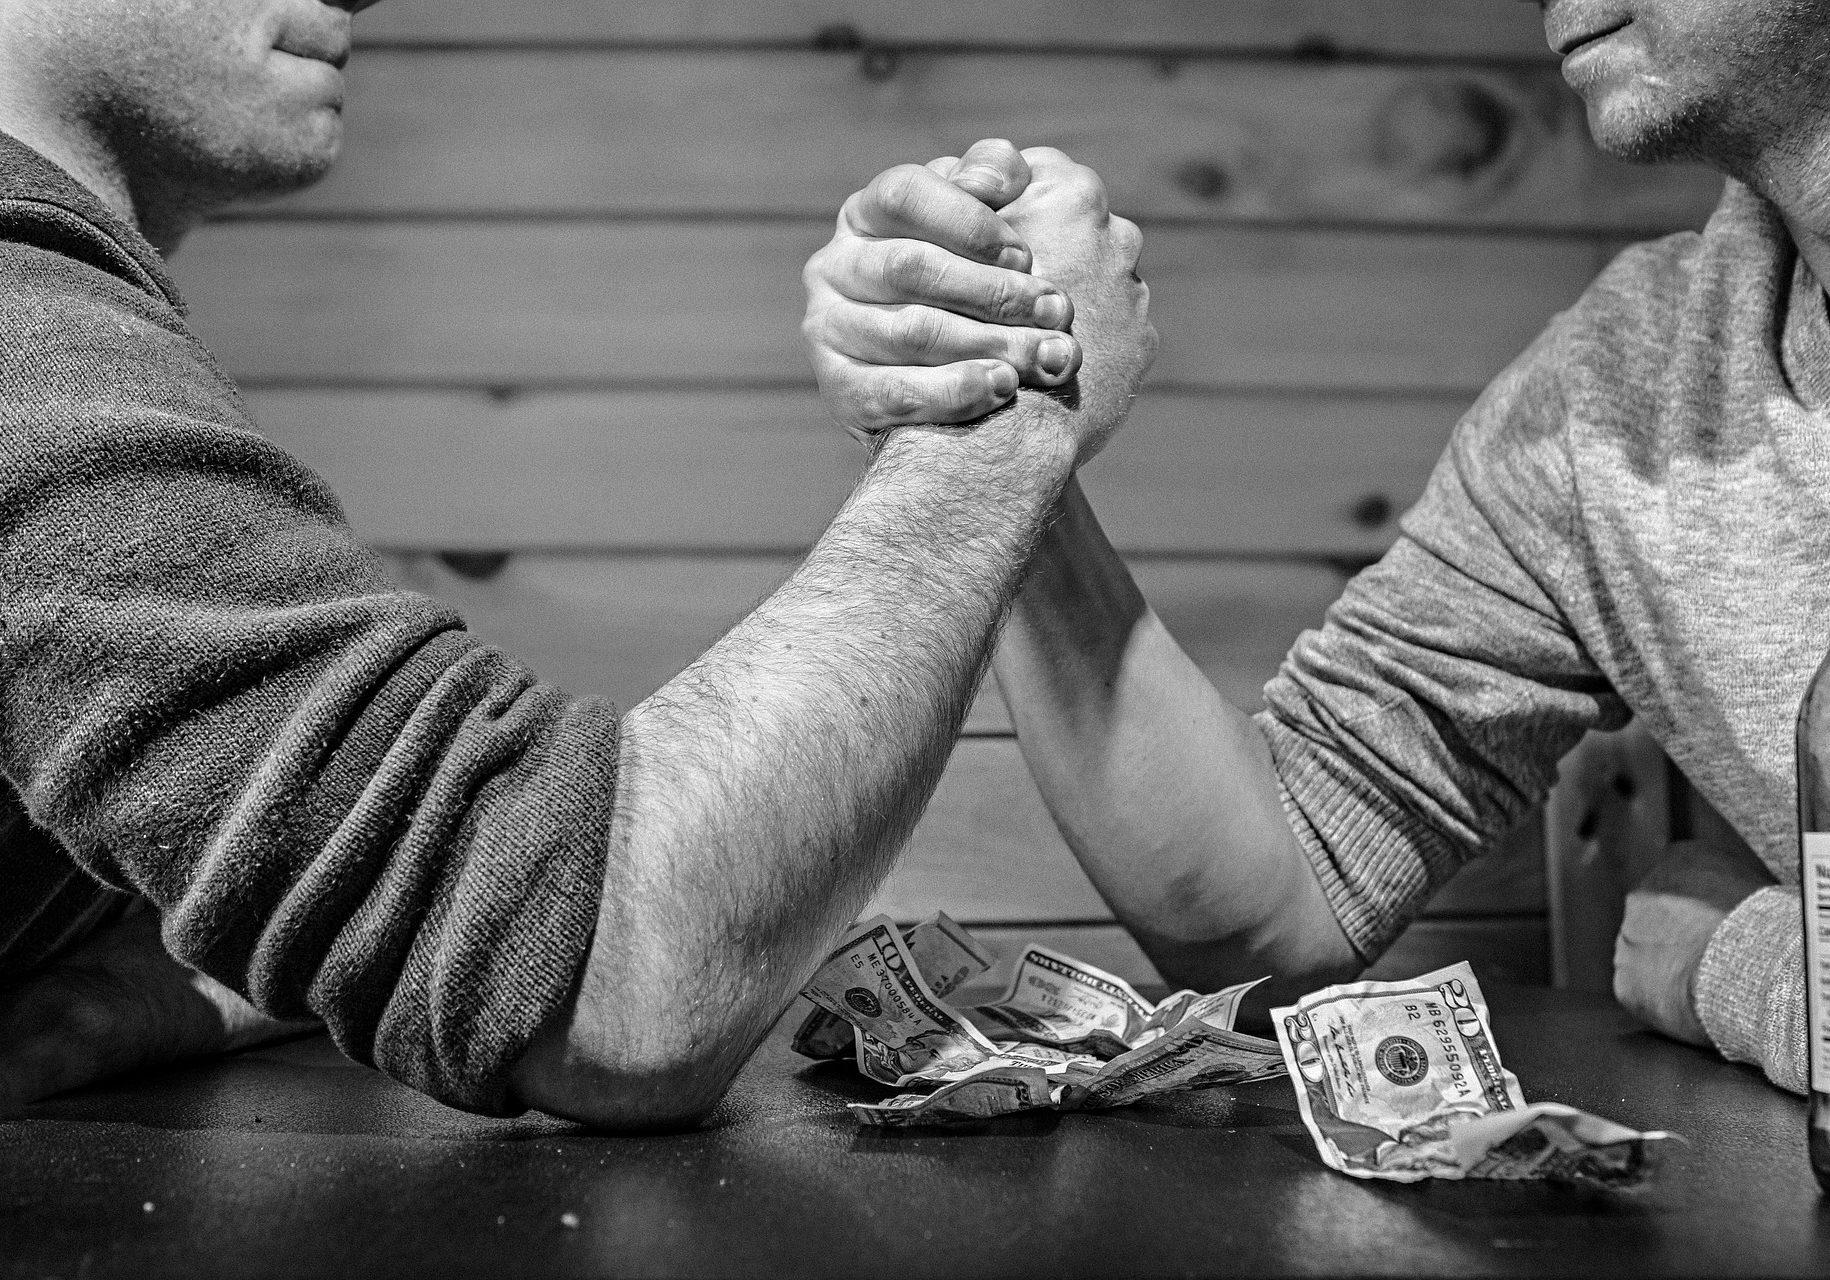 arm-wrestling-567950_1920